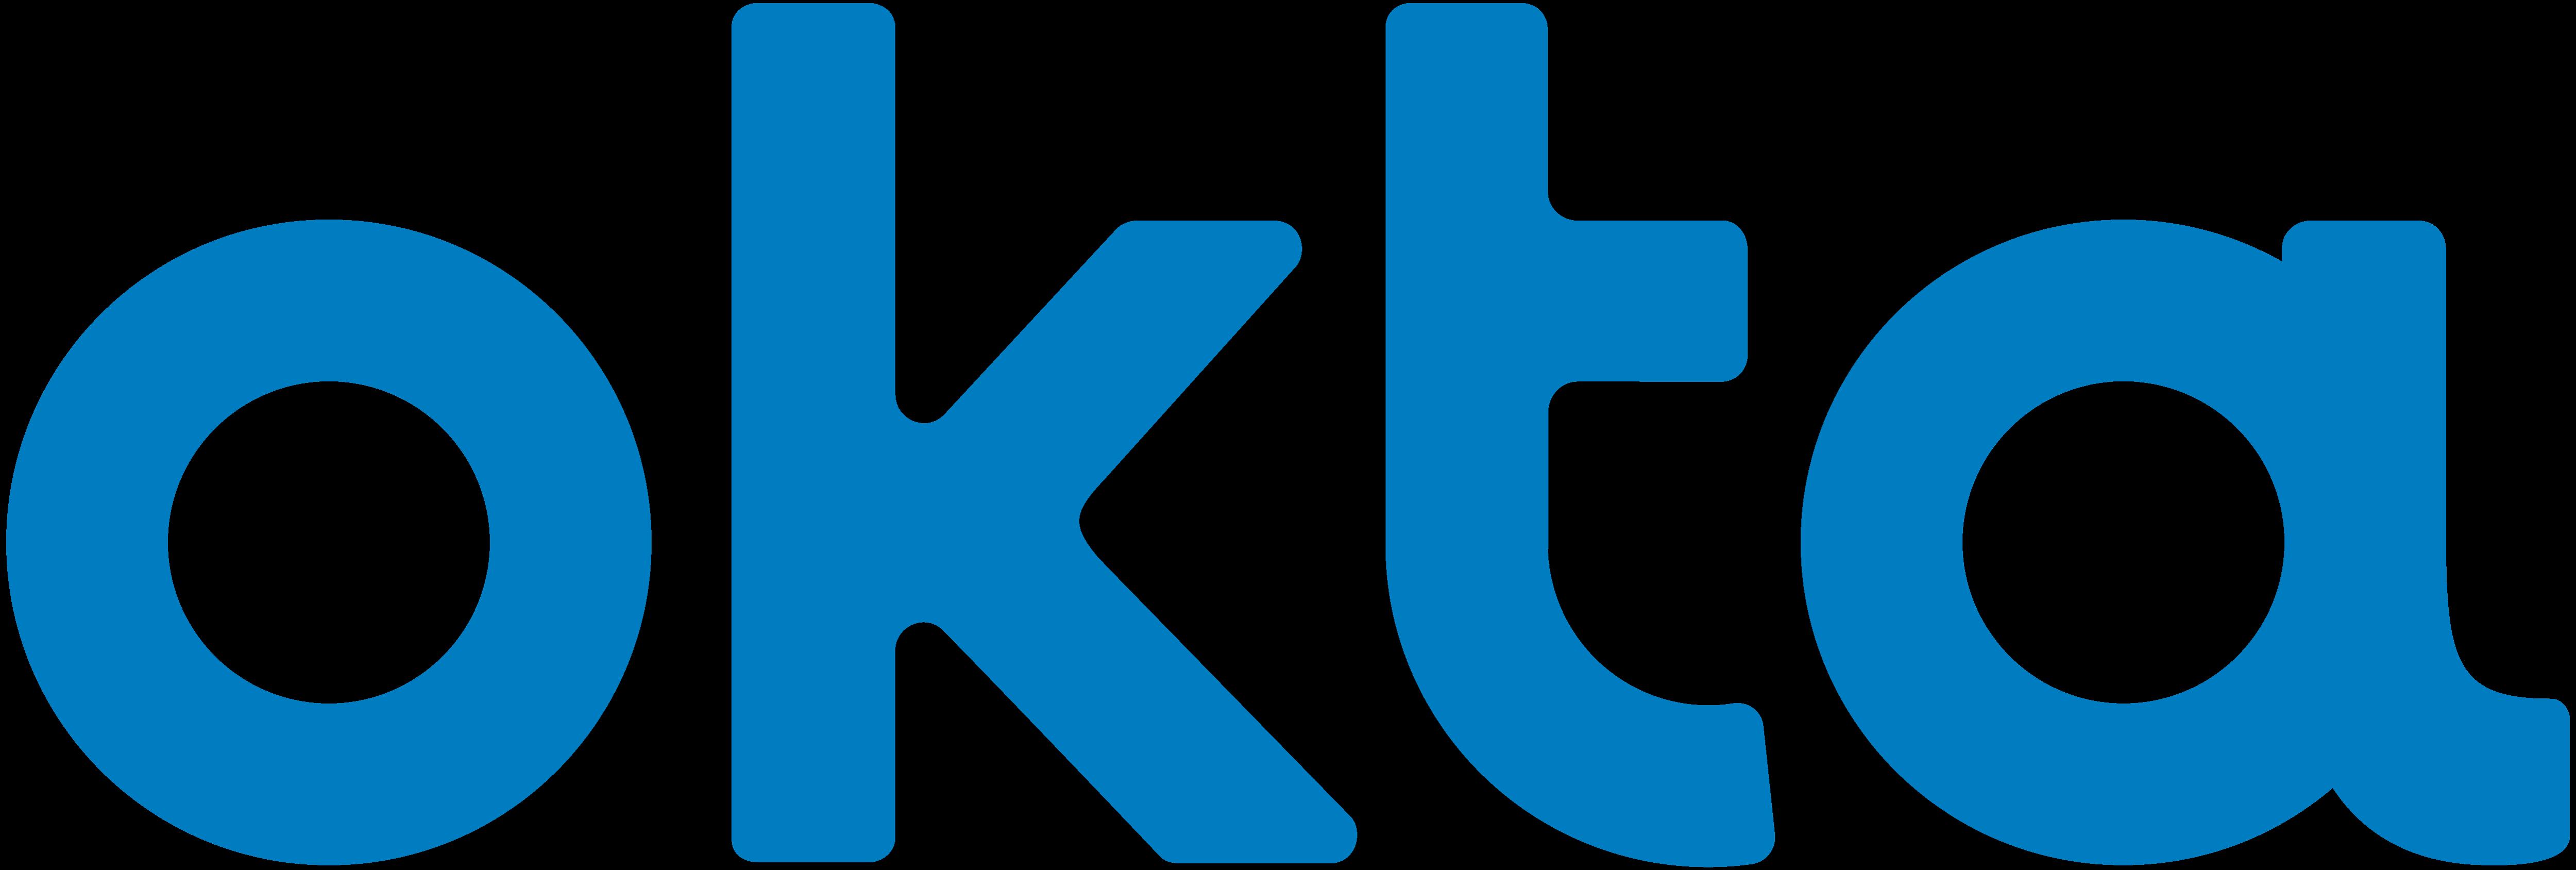 Okta_Logo_BrightBlue_Large-1